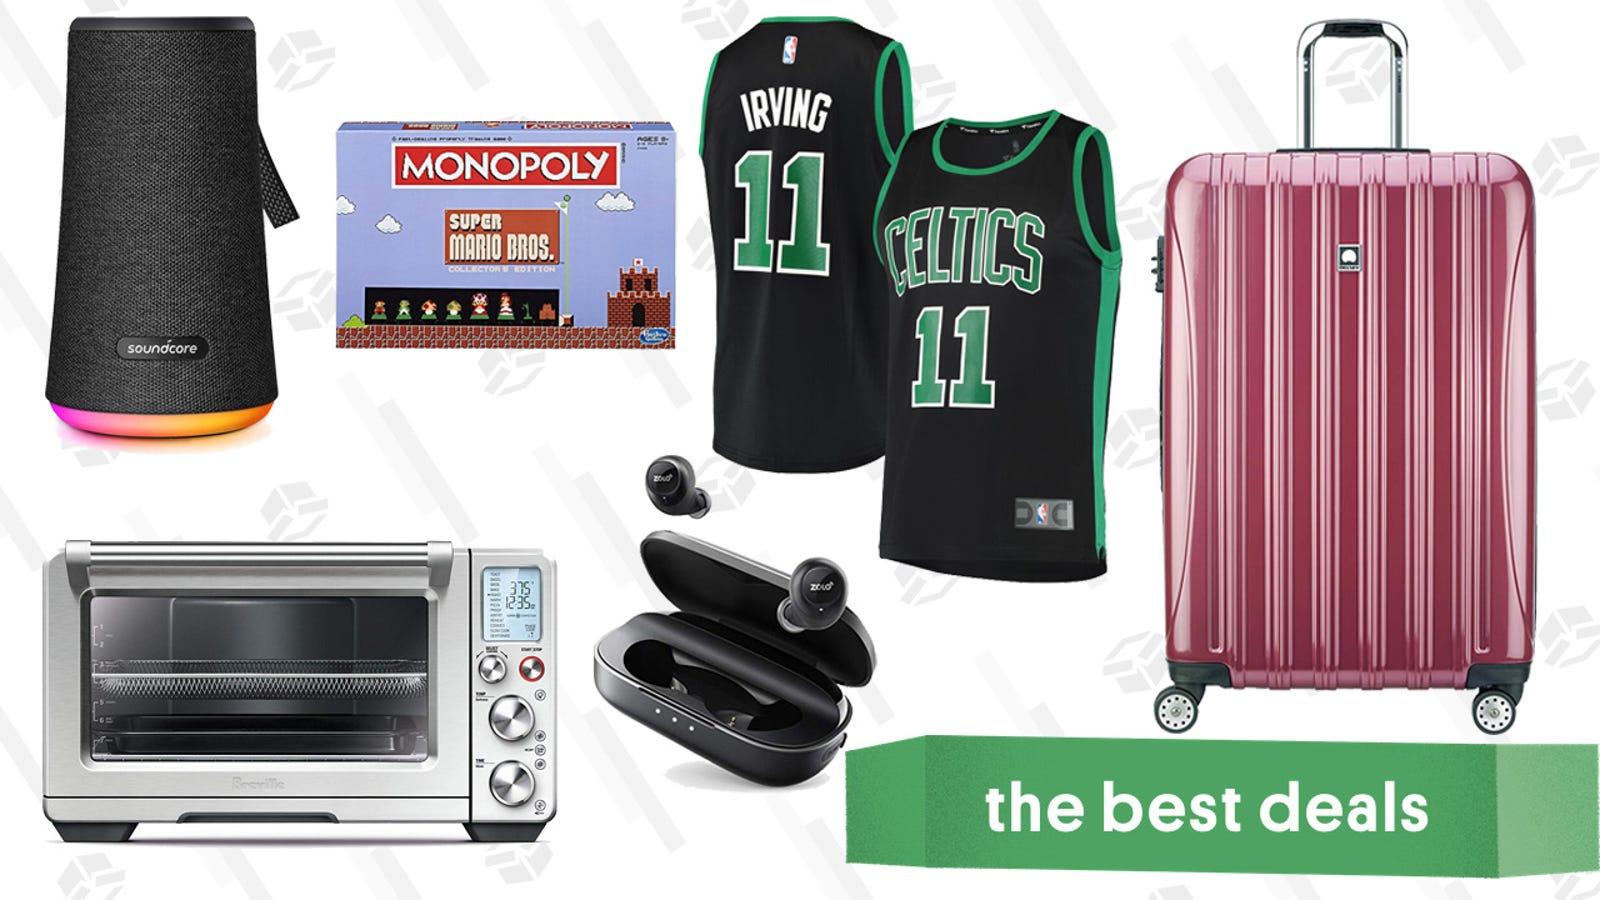 QnA VBage Saturday's Best Deals: Fanatics, BioBidet, Breville Smart Oven, and More